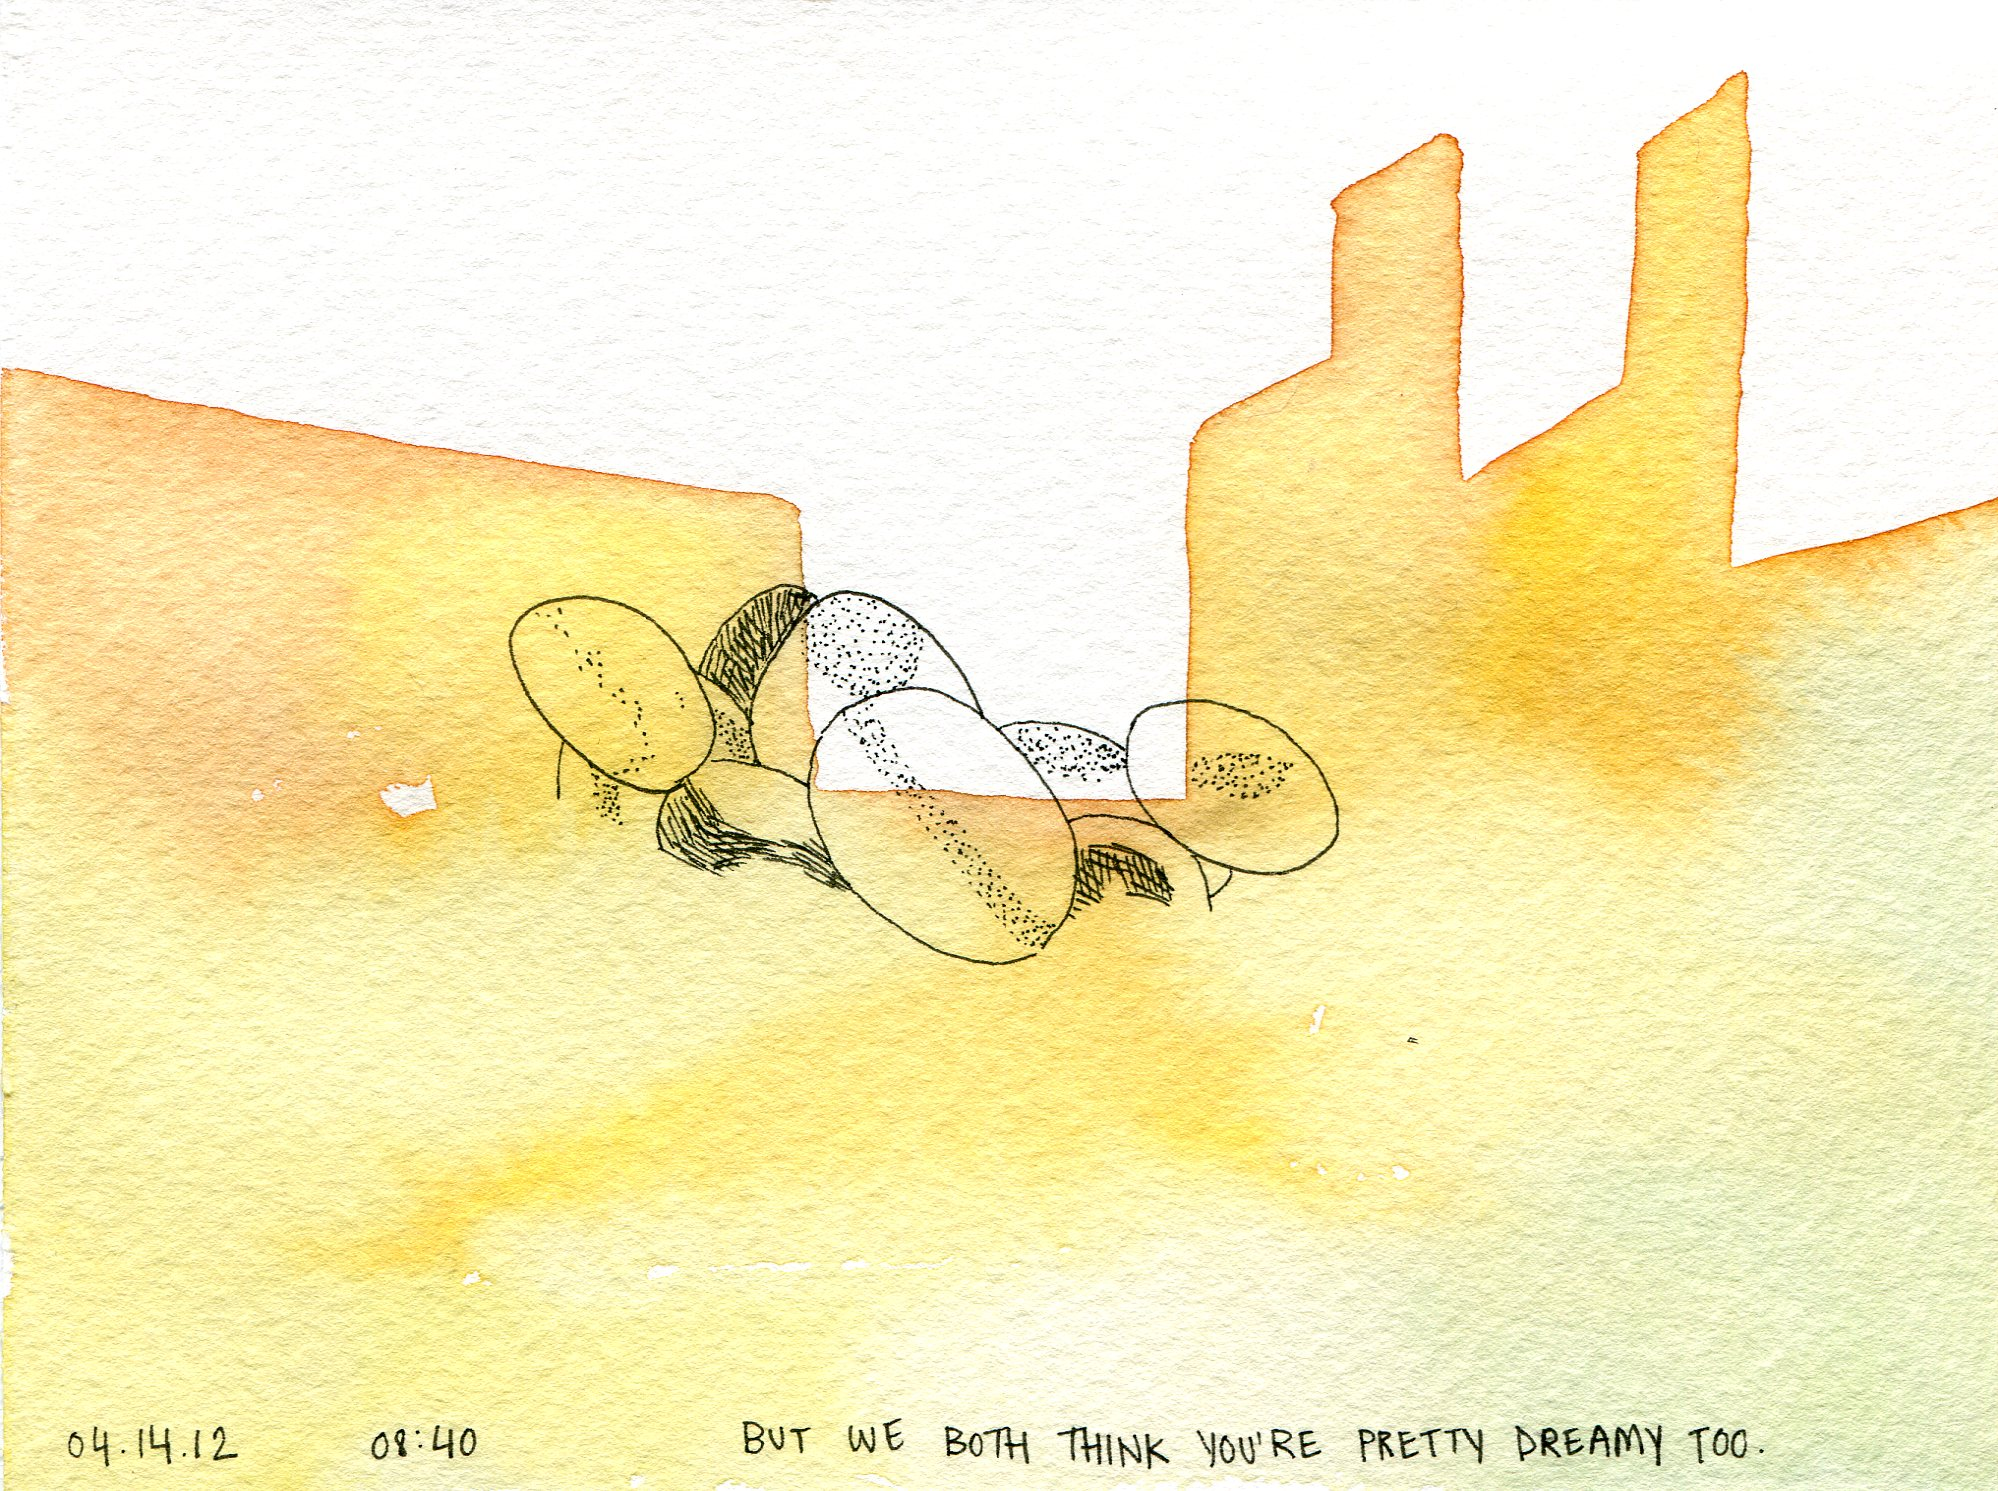 2012-04-14 drawing007.jpg